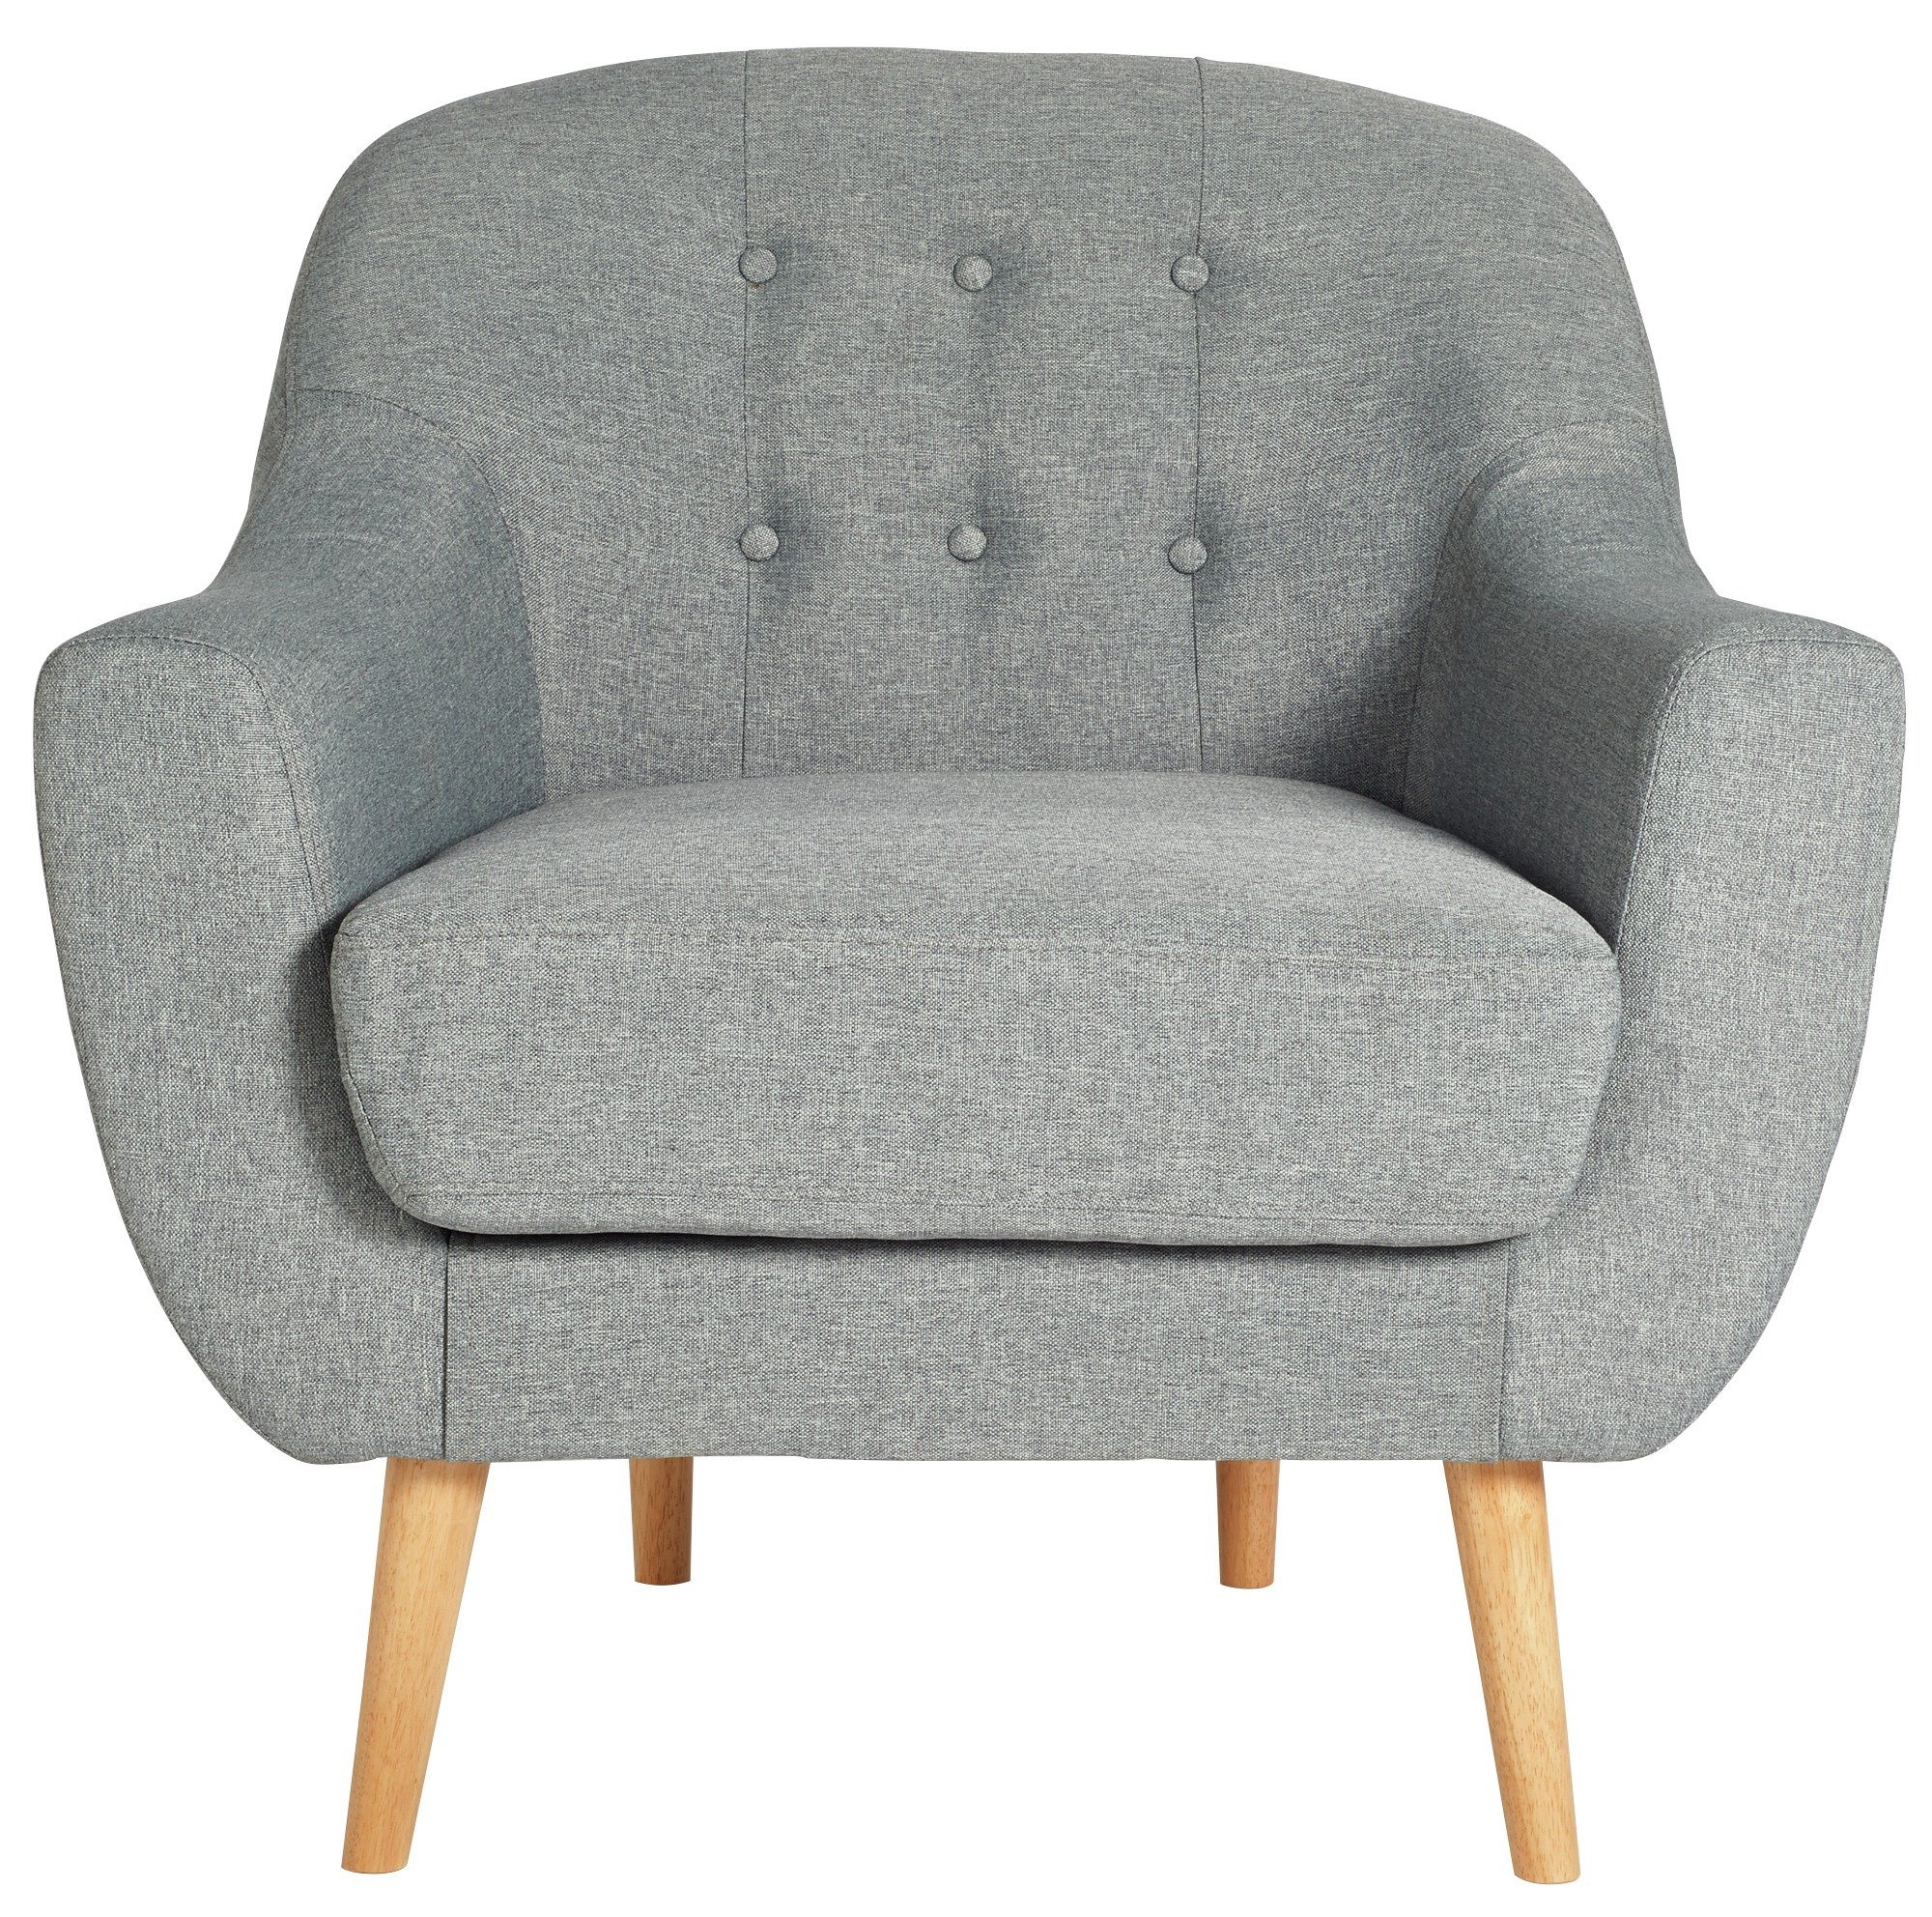 Hygena Lexie Fabric Chair   Light Grey